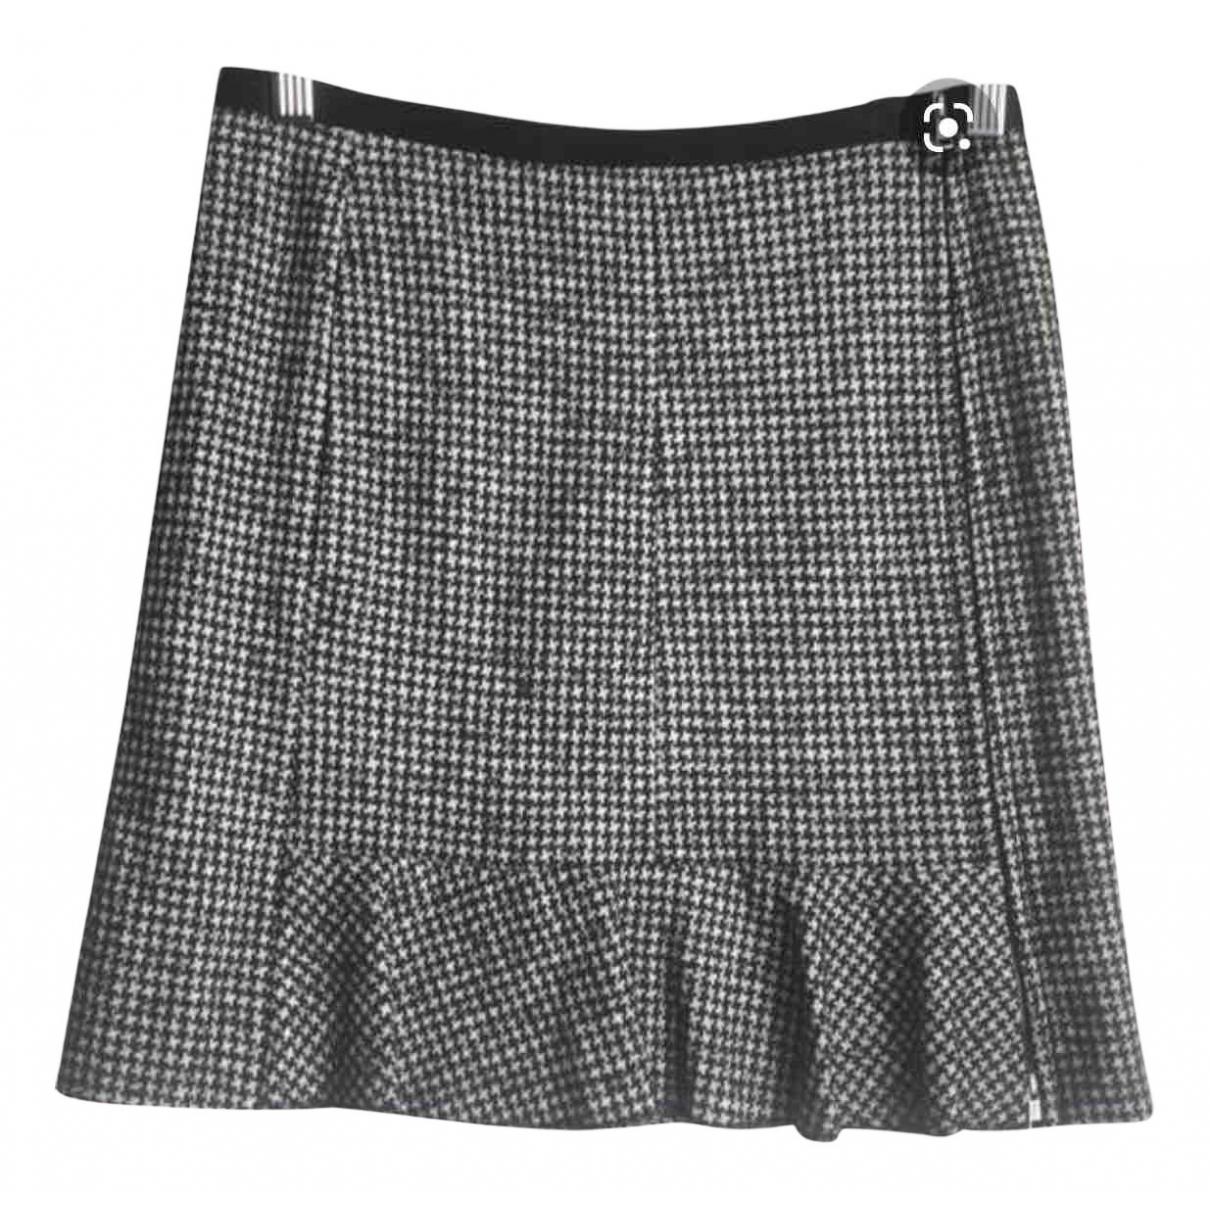 Sonia By Sonia Rykiel - Jupe   pour femme en laine - noir